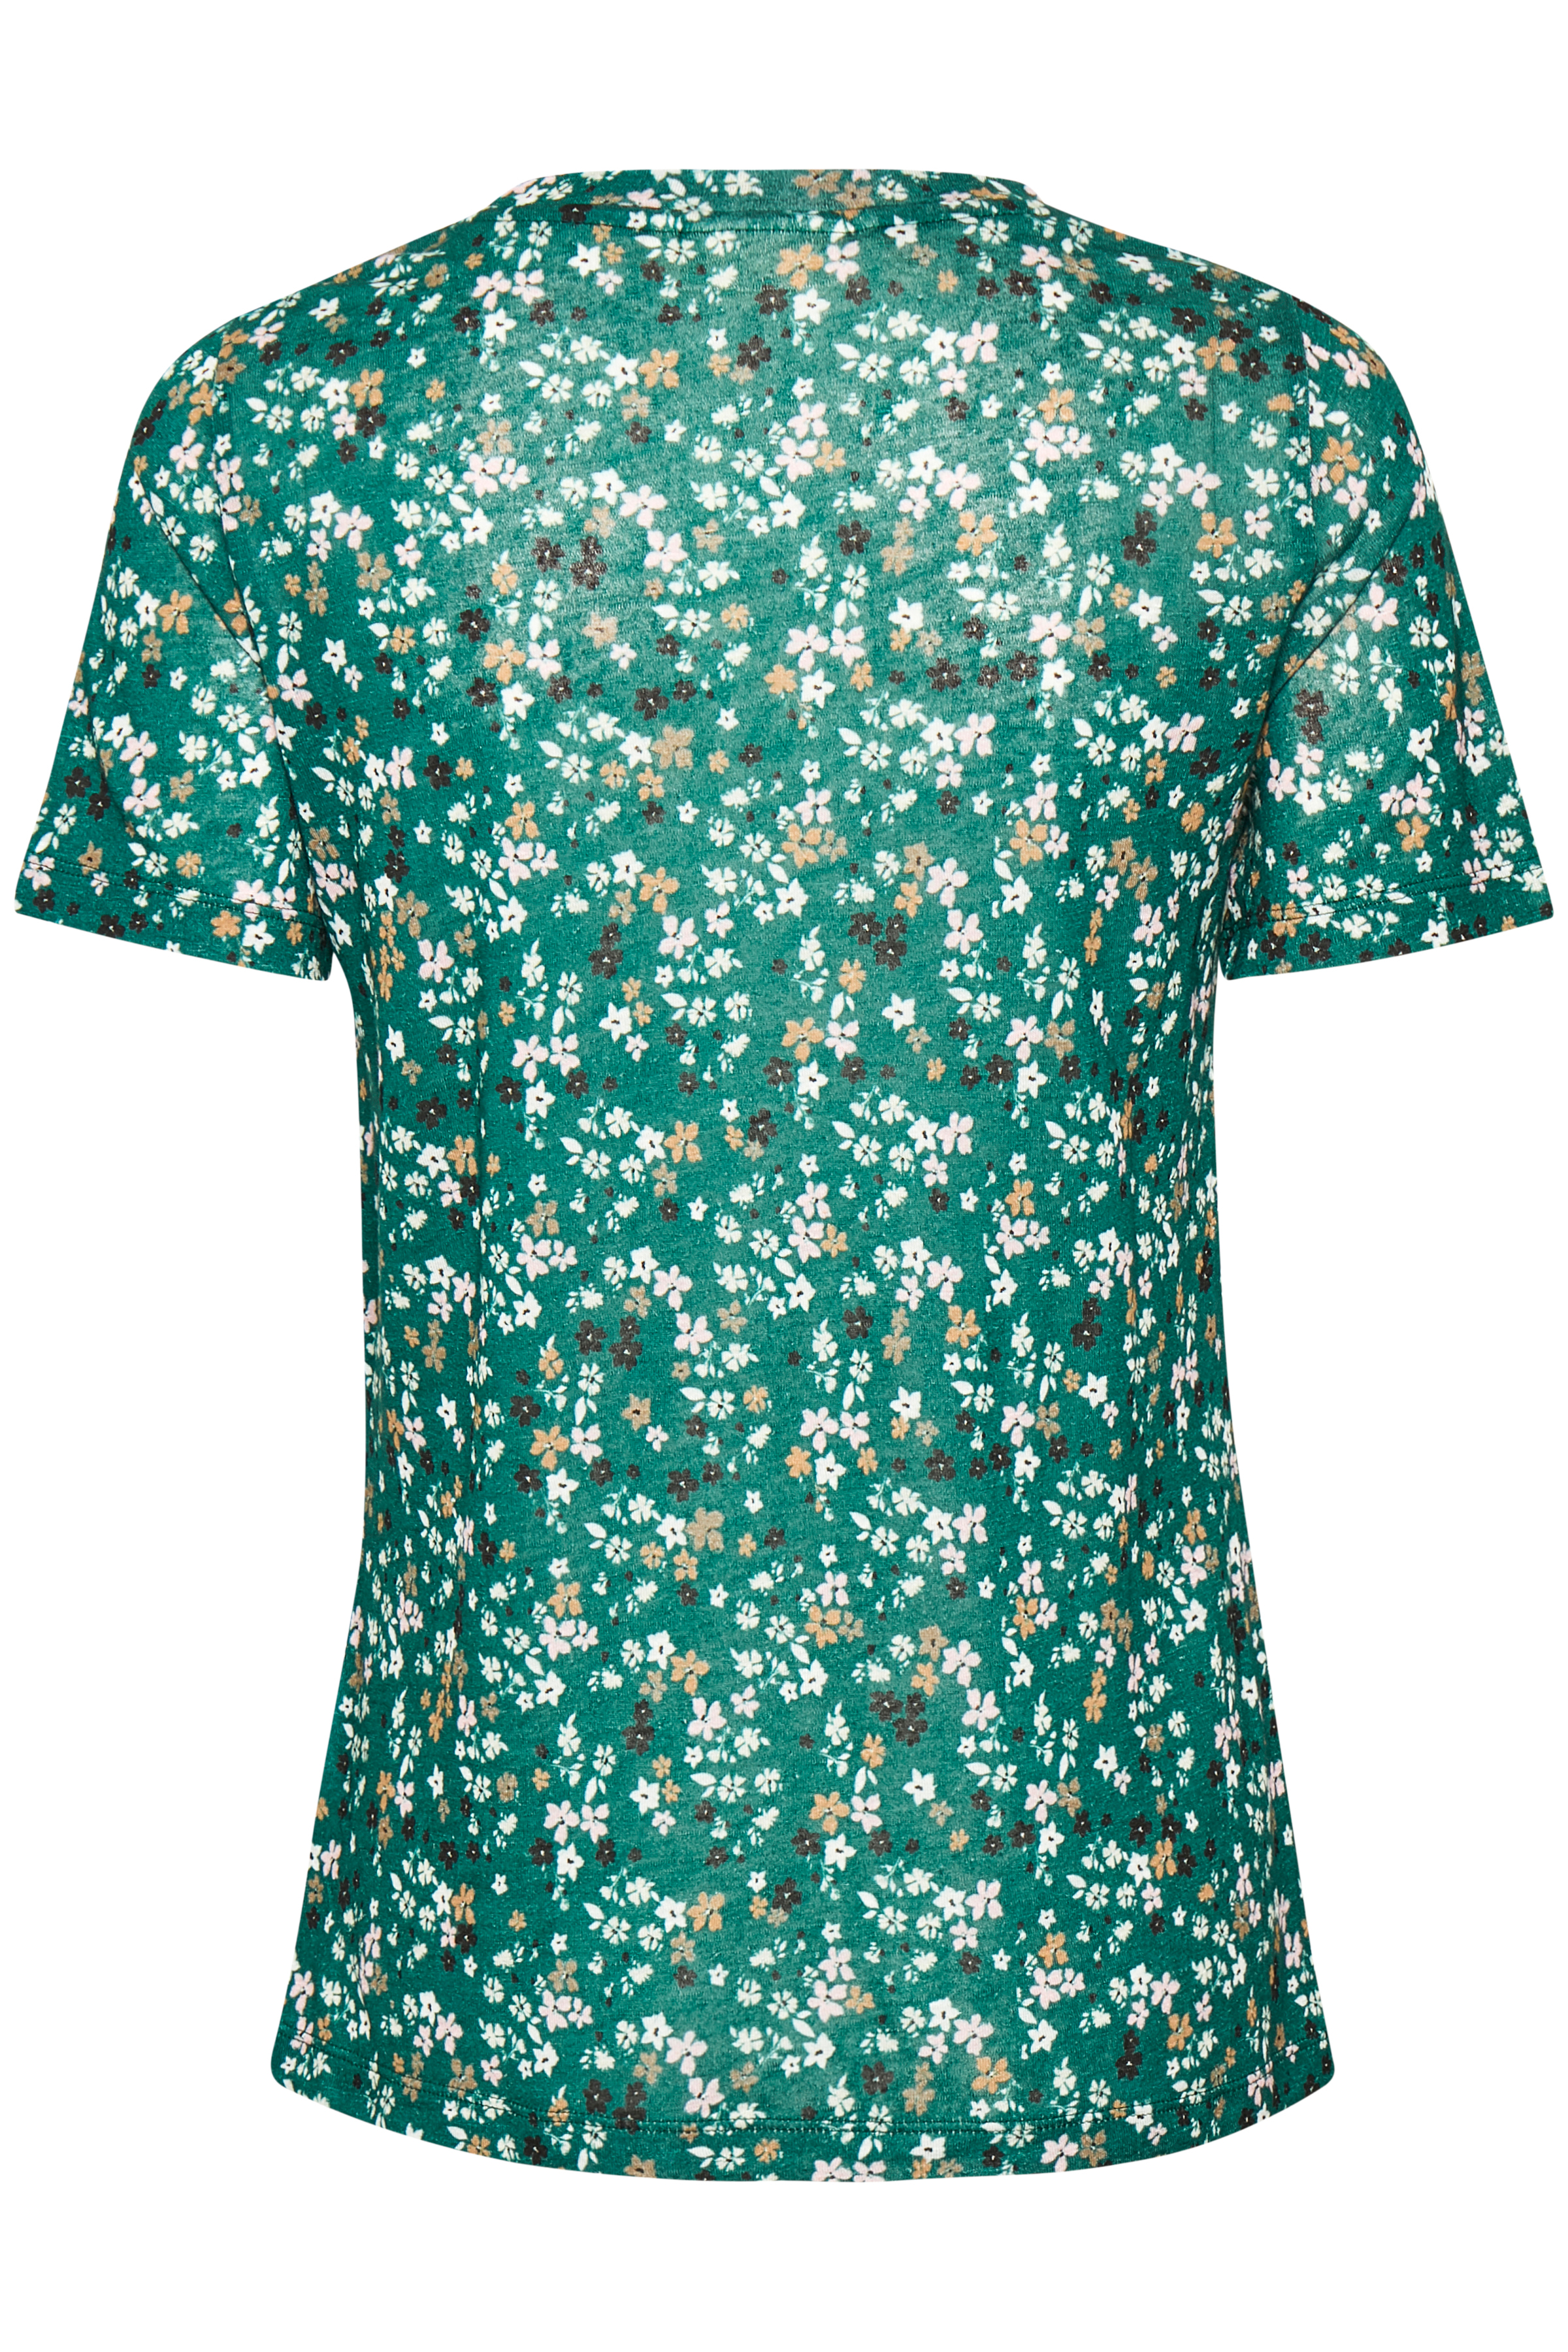 Warm Green Ditsy Flowers T-Shirt – Køb Warm Green Ditsy Flowers T-Shirt fra str. XS-XXL her